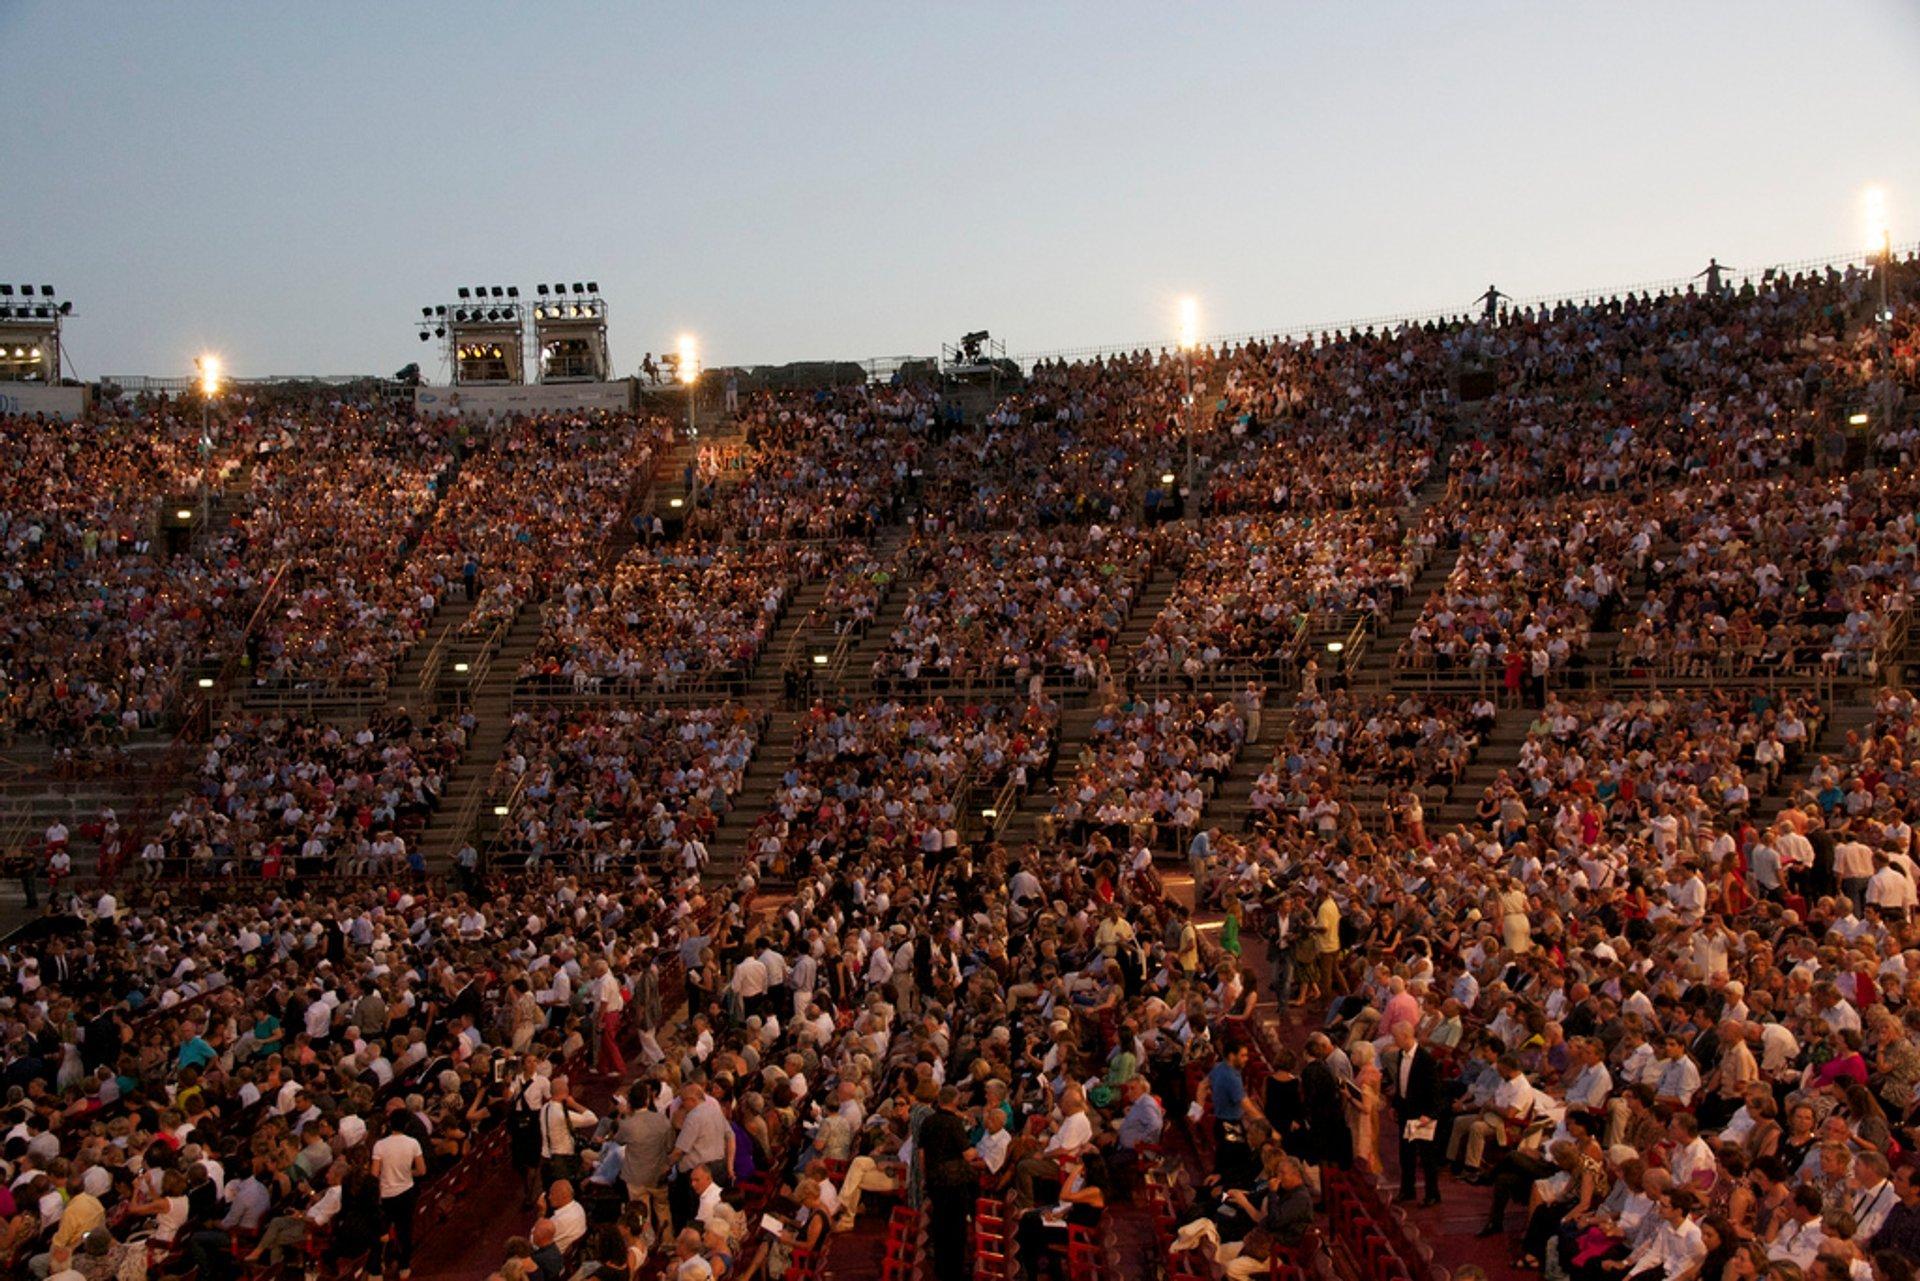 Arena di Verona Opera Festival in Italy - Best Season 2020